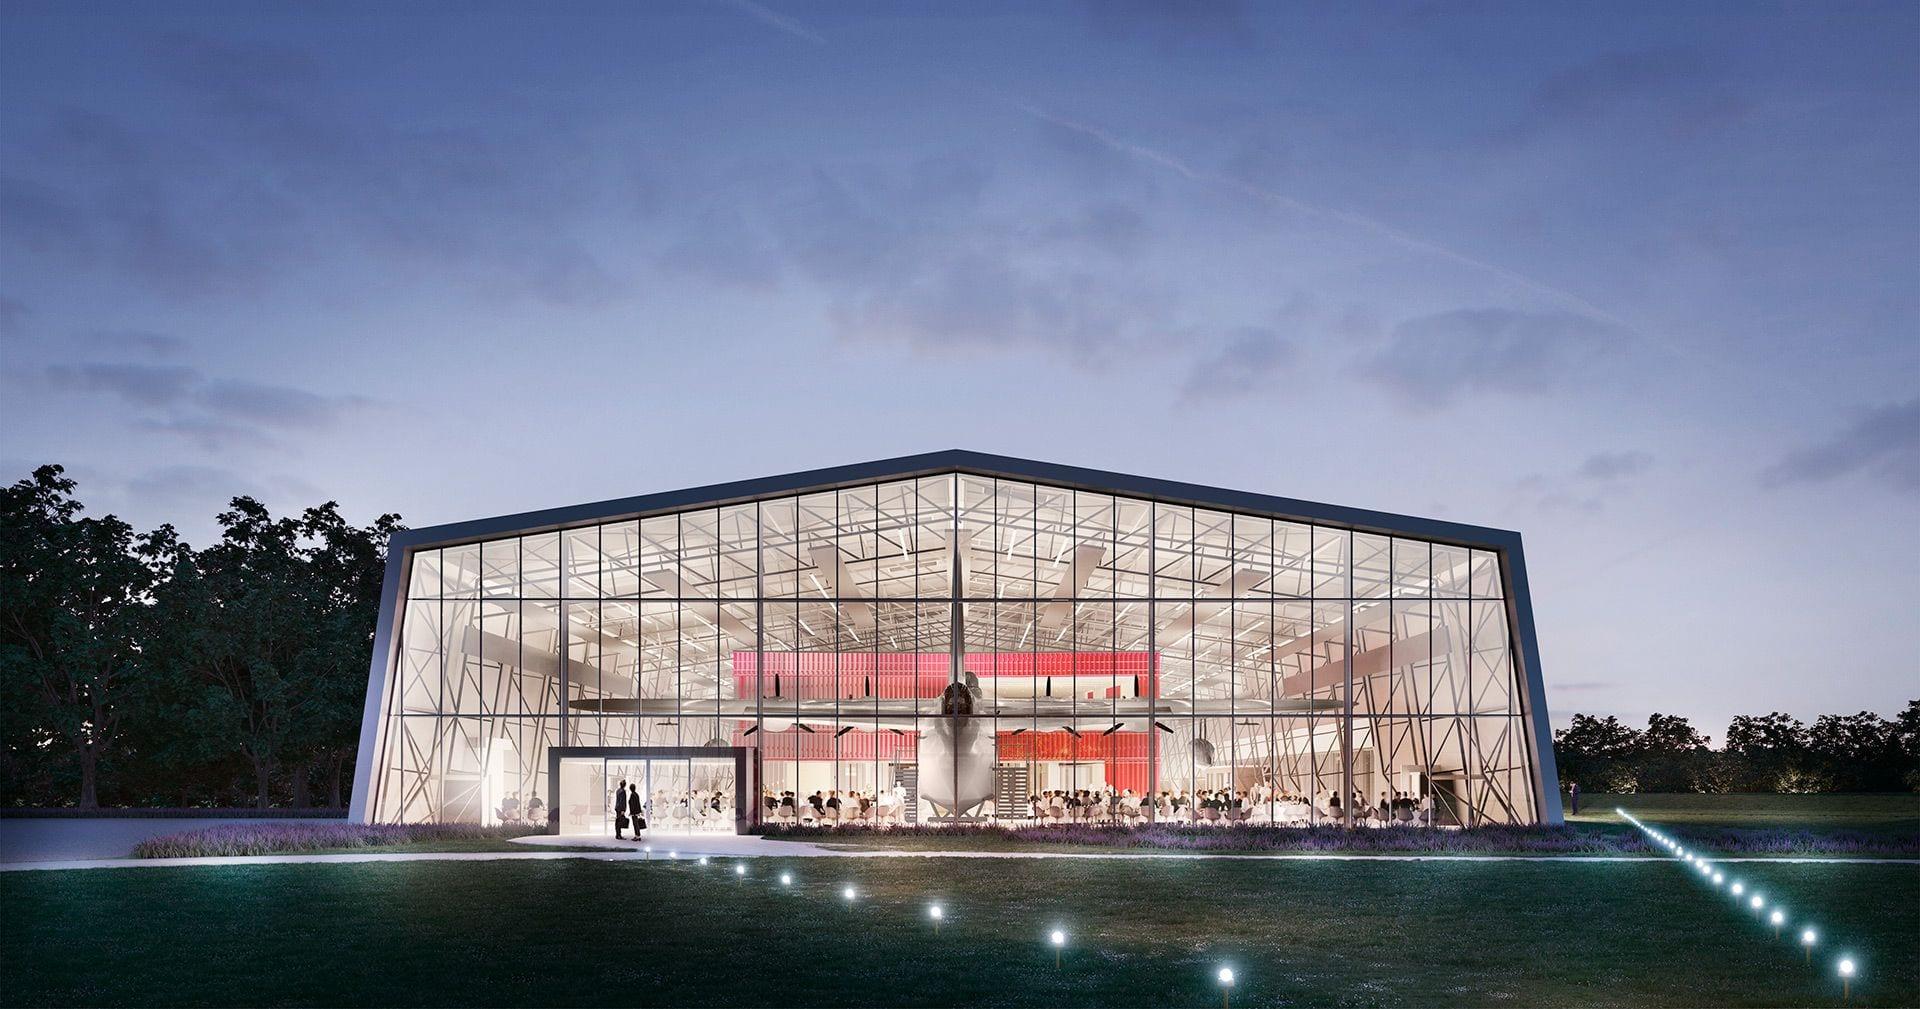 RAF Museum hendon aerodrome new plans revealed